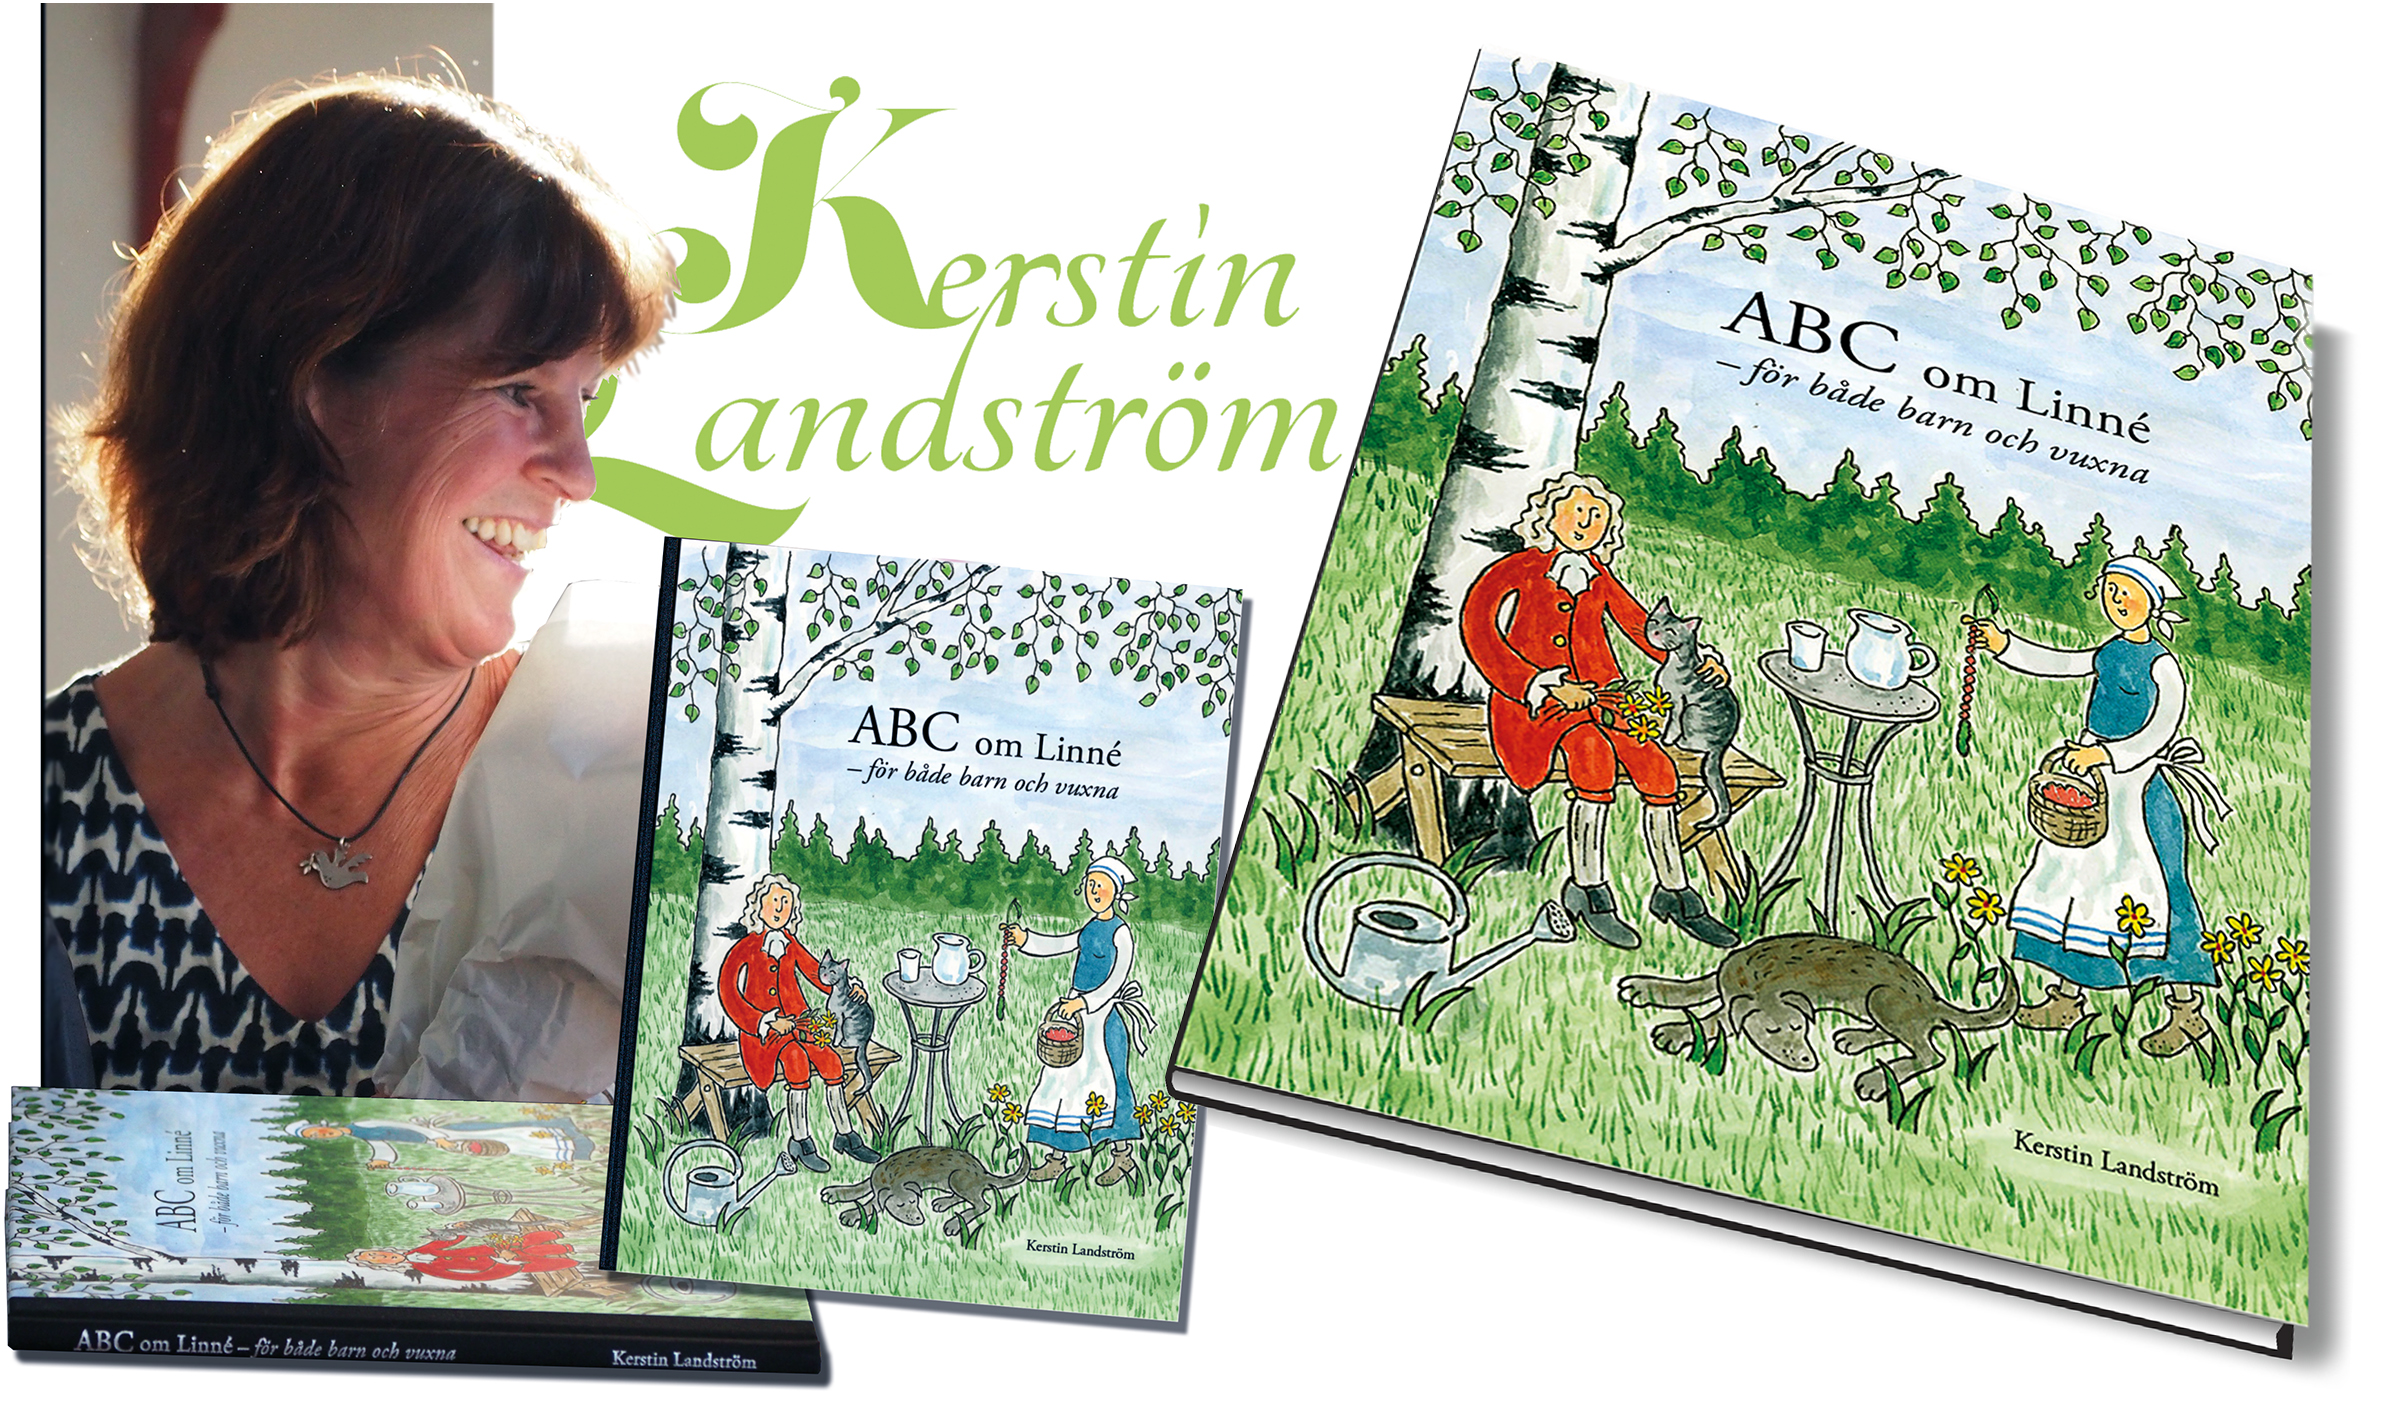 Kerstin Landström >> ABC om Linné